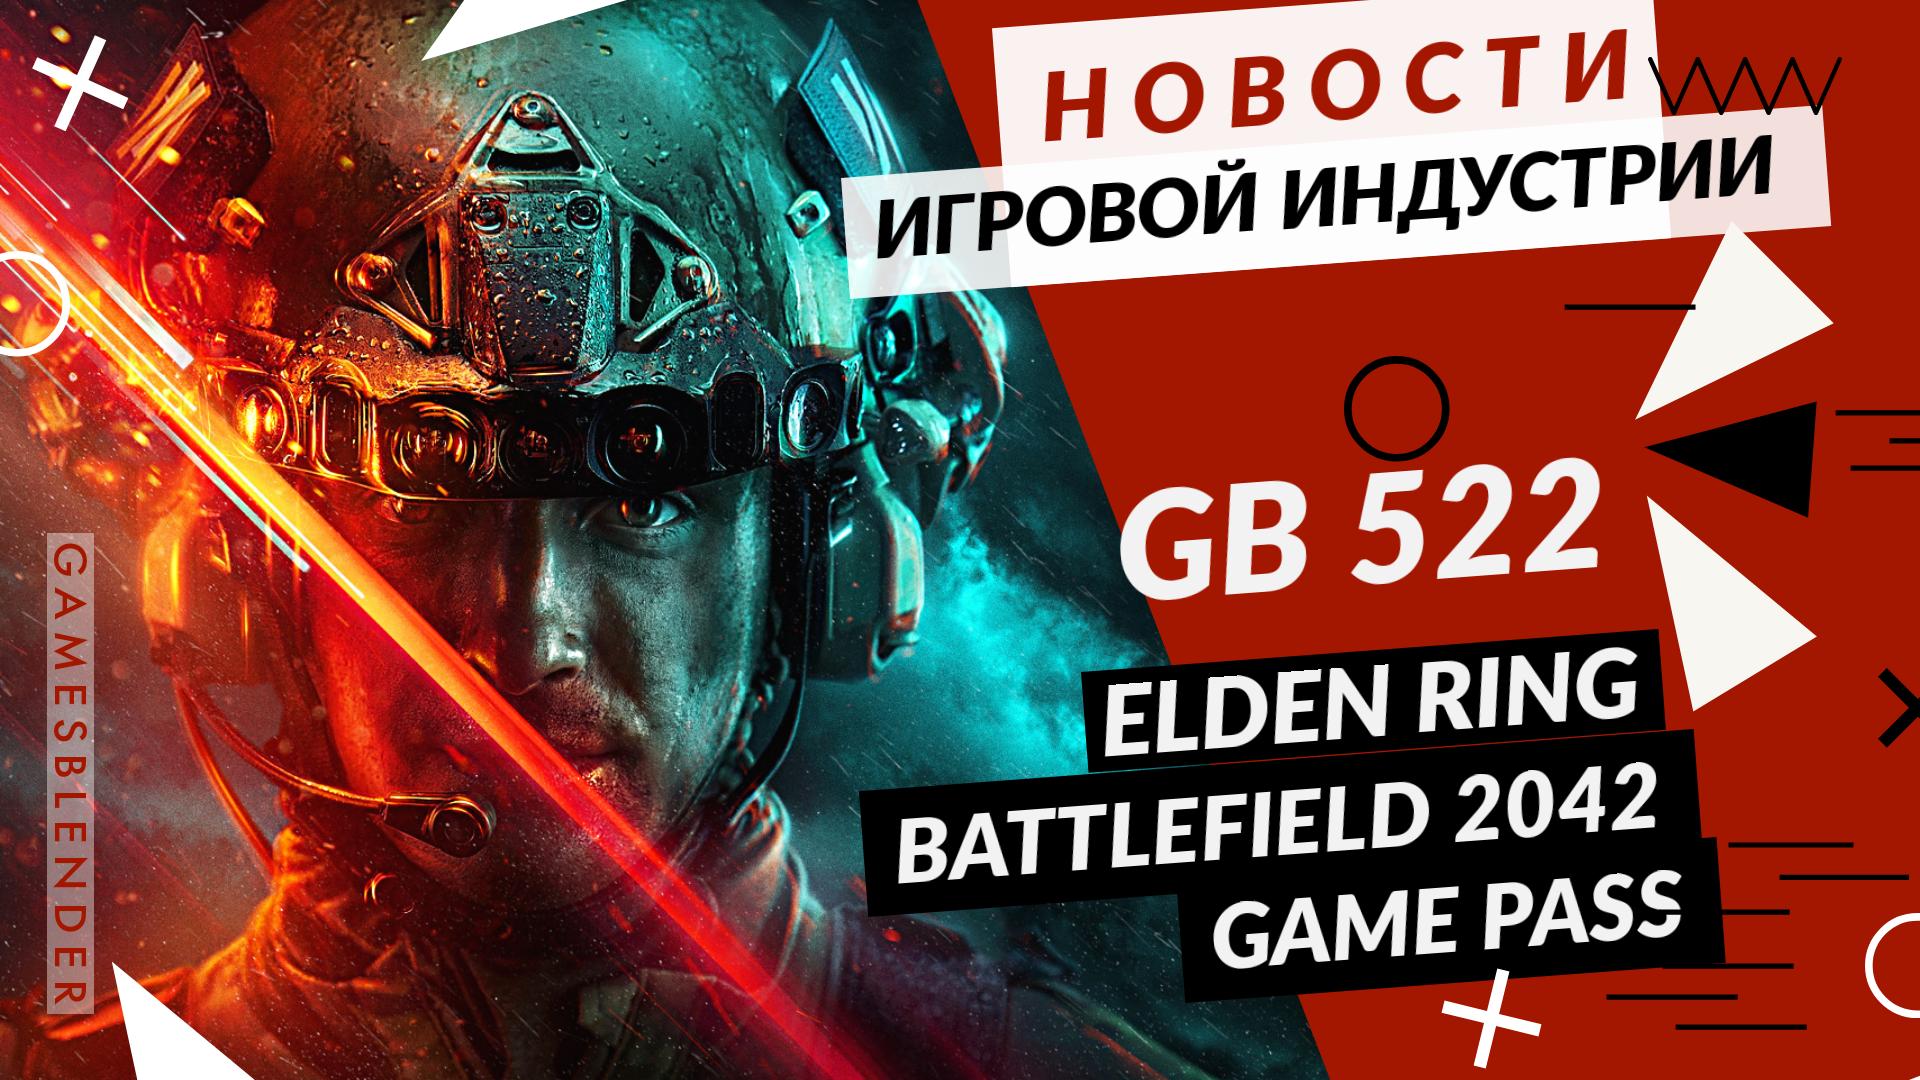 Gamesblender  522: Elden Ring / Battlefield 2042 / Cyberpunk 2077 / Tiny Tinas Wonderlands